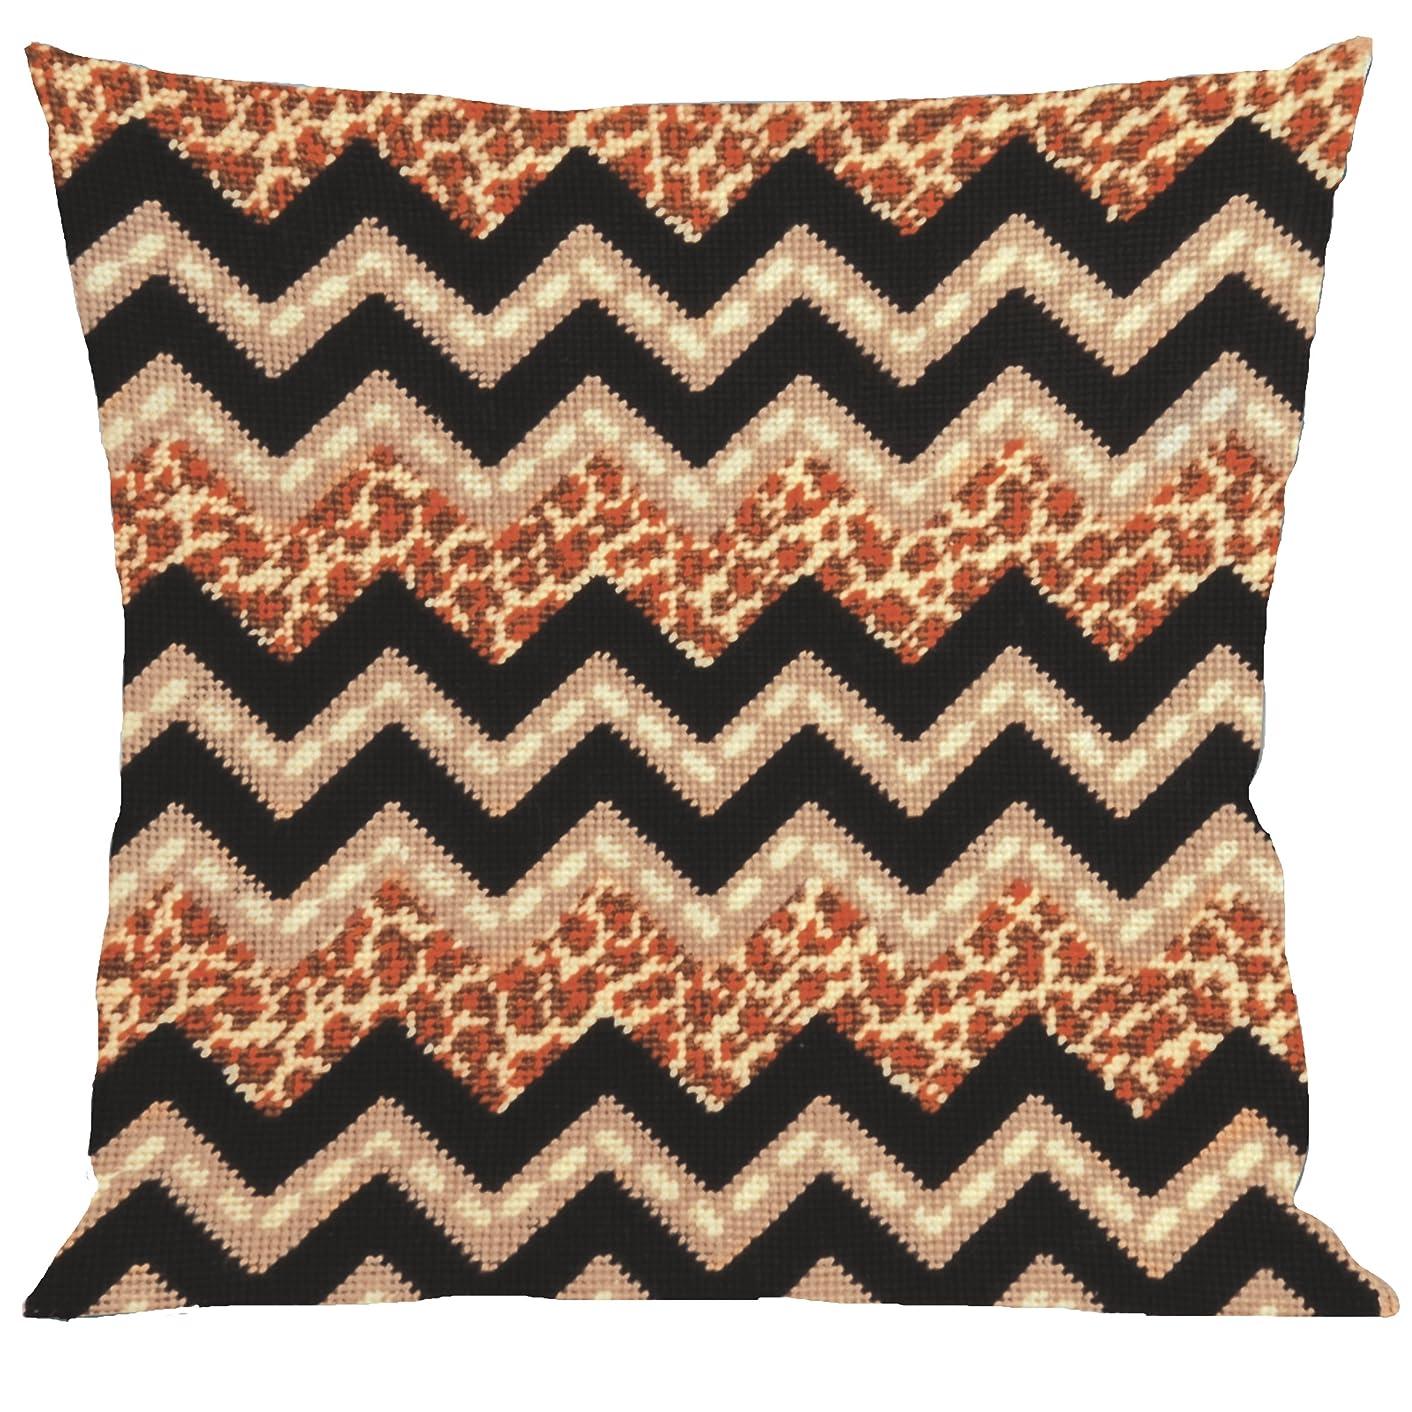 Tobin Needlepoint Kit Stitched in Yarn, 12 by 12-Inch, Leopard Zig Zag